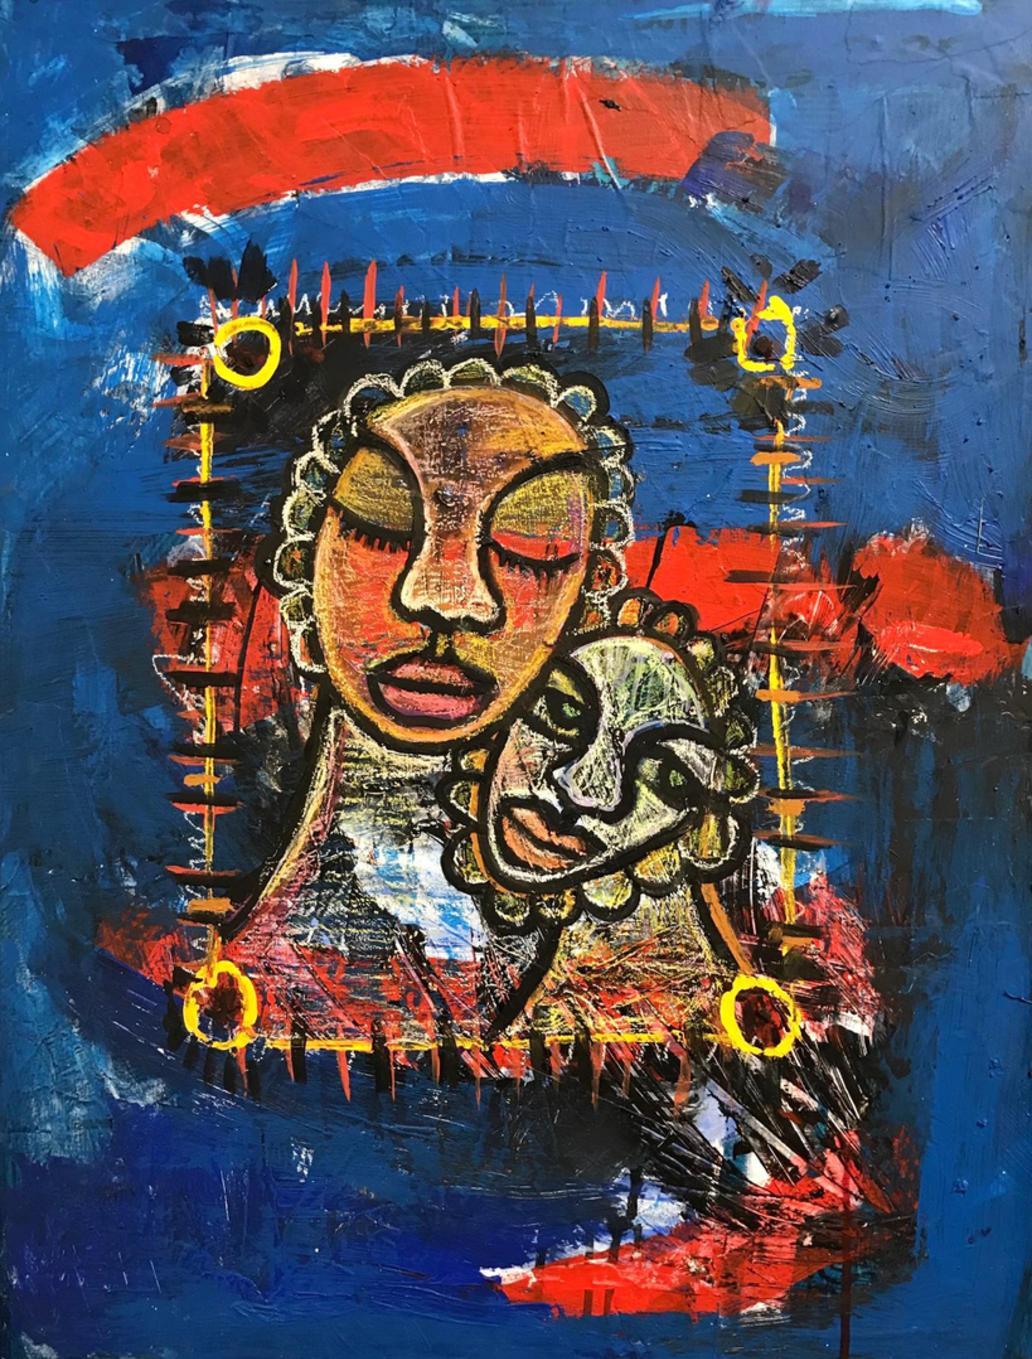 Nourishing Blue Memories (Triptych), 18x24 each, Acrylic, gouache on canvas 2017  - 2/3